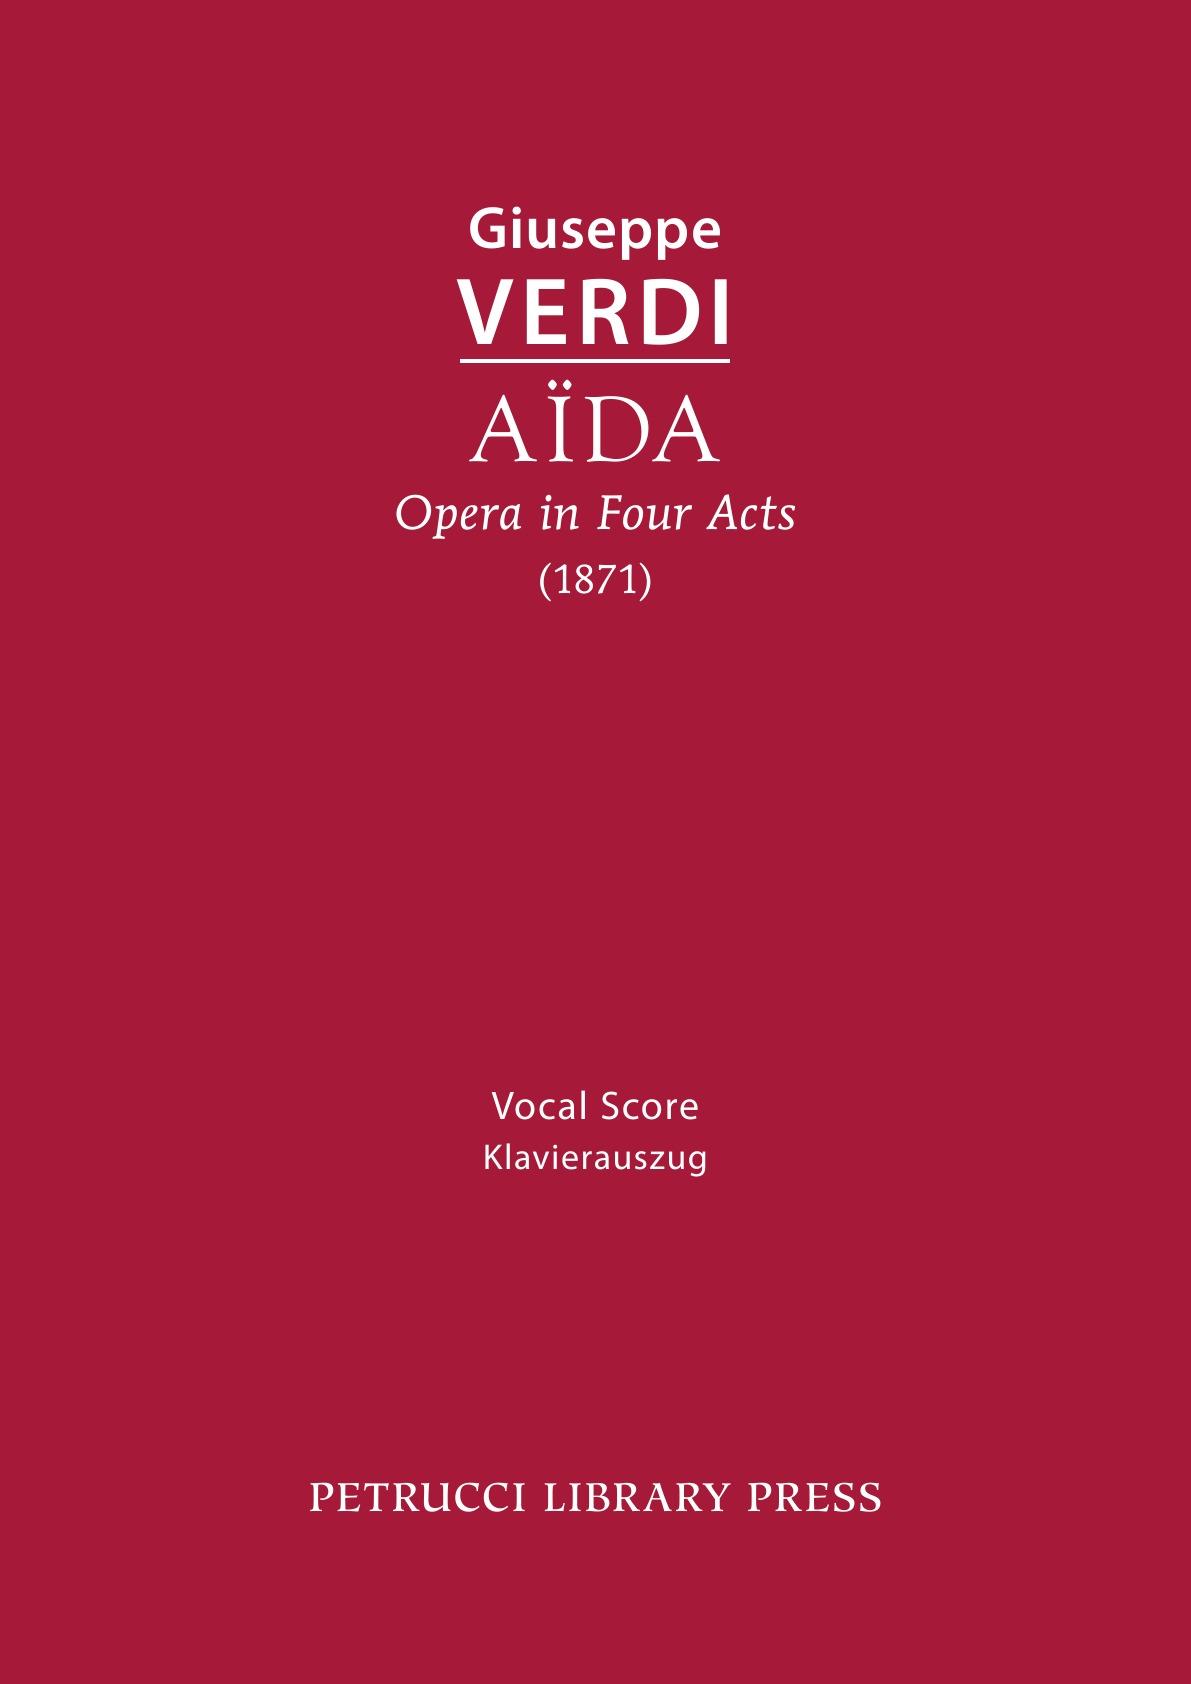 Giuseppe Verdi Aida, Opera in Four Acts. Vocal score giuseppe verdi ein maskenball un ballo in maschera